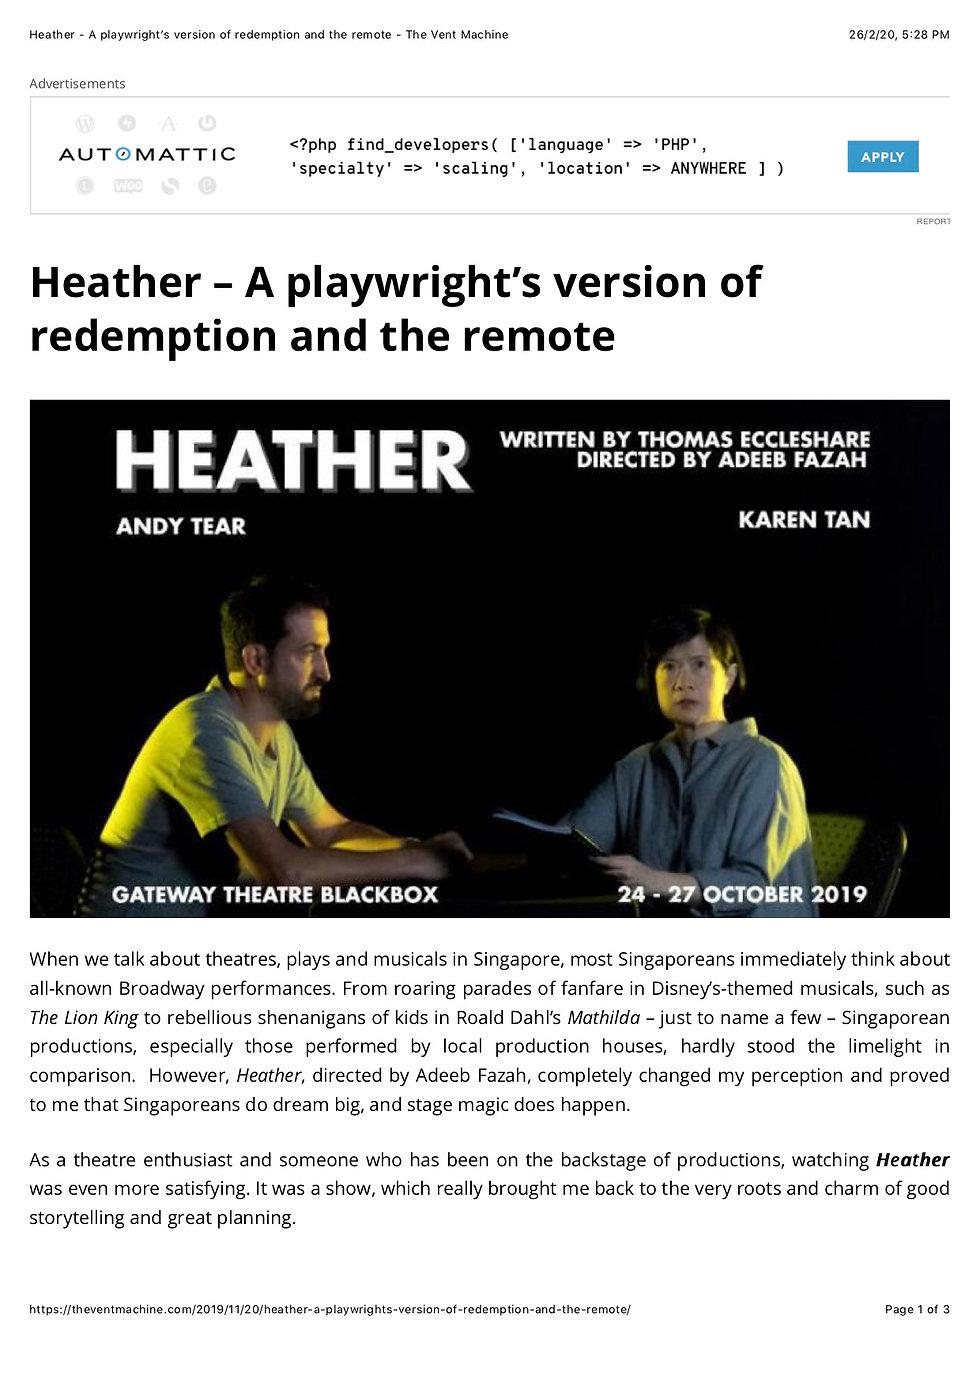 Heather - The Vent Machine pg1.jpg